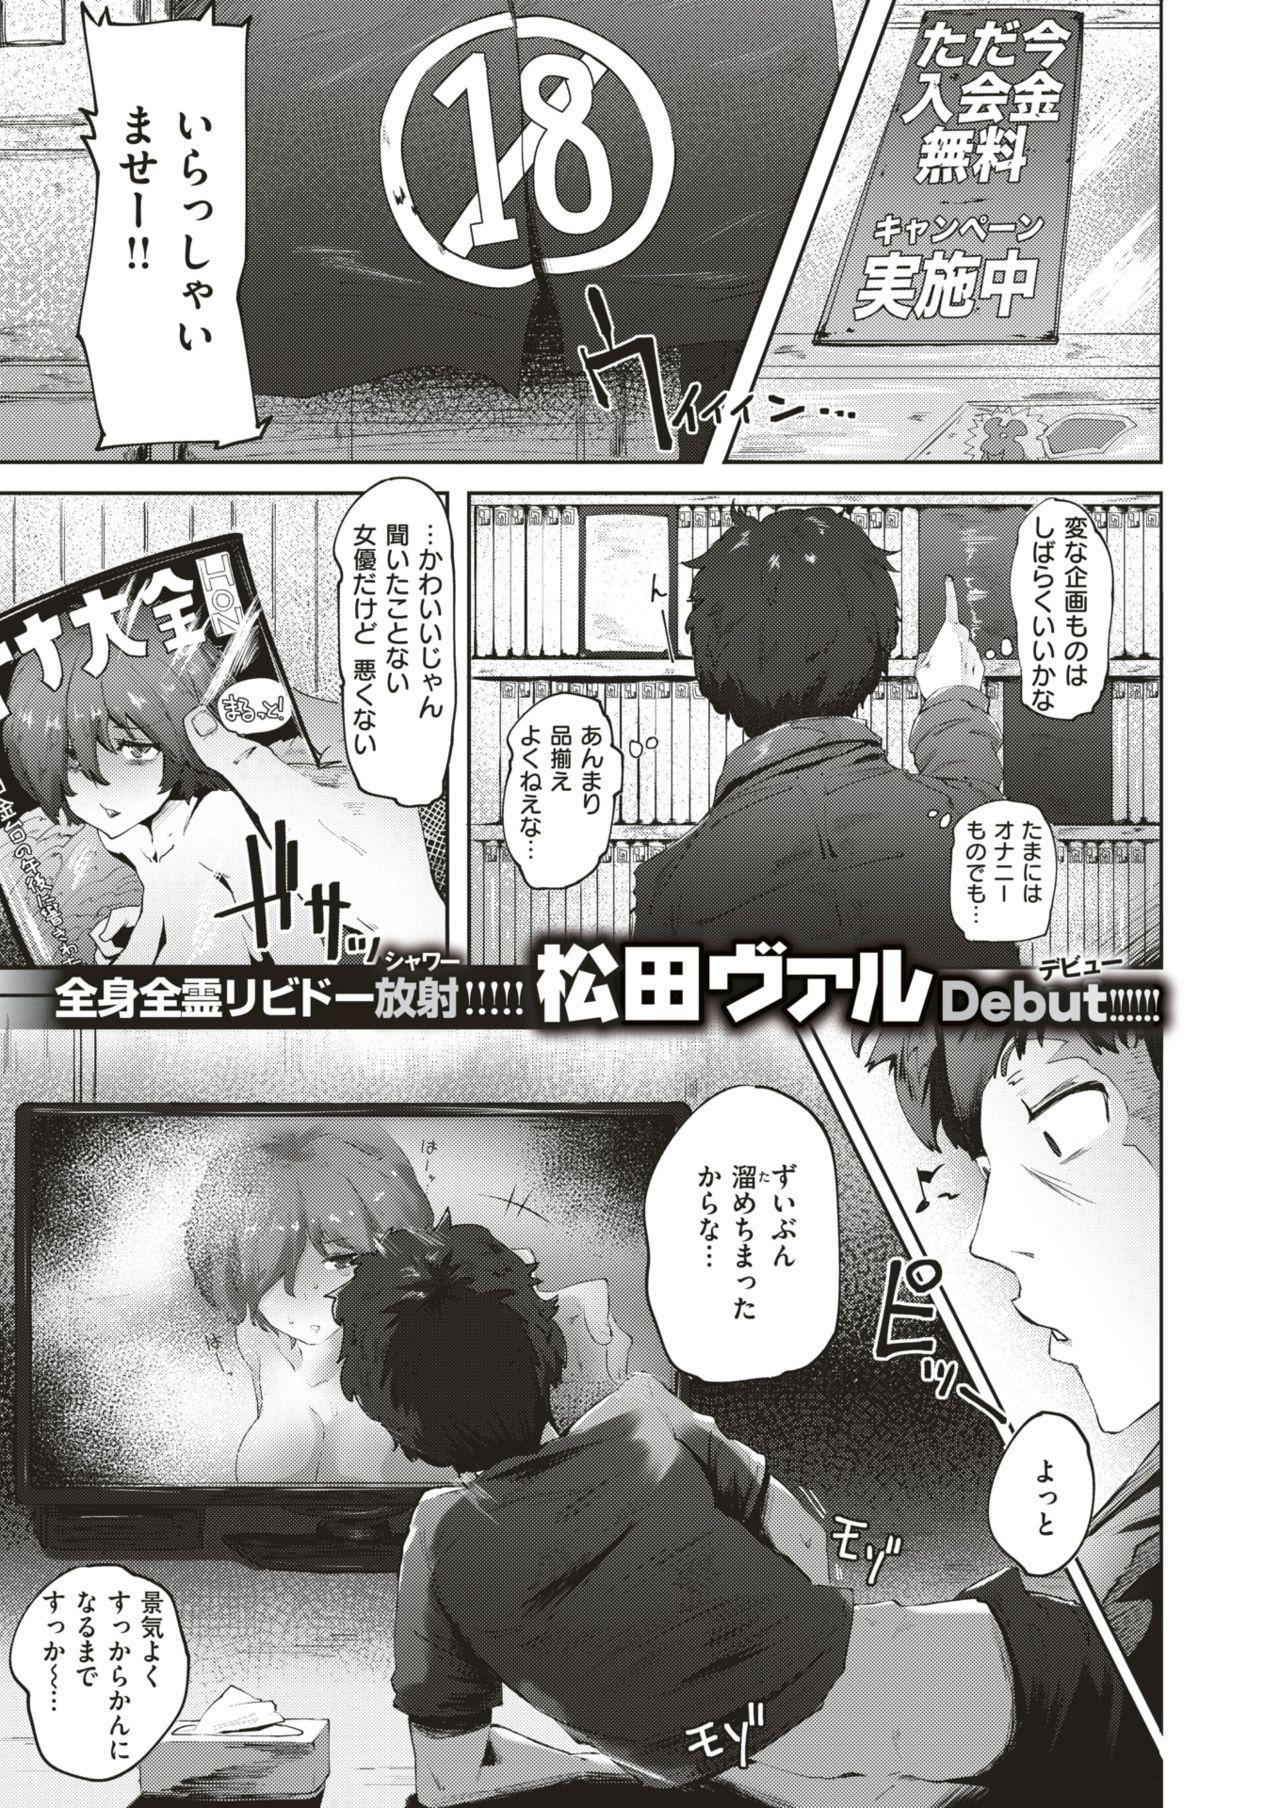 COMIC HAPPINING Vol. 4 127